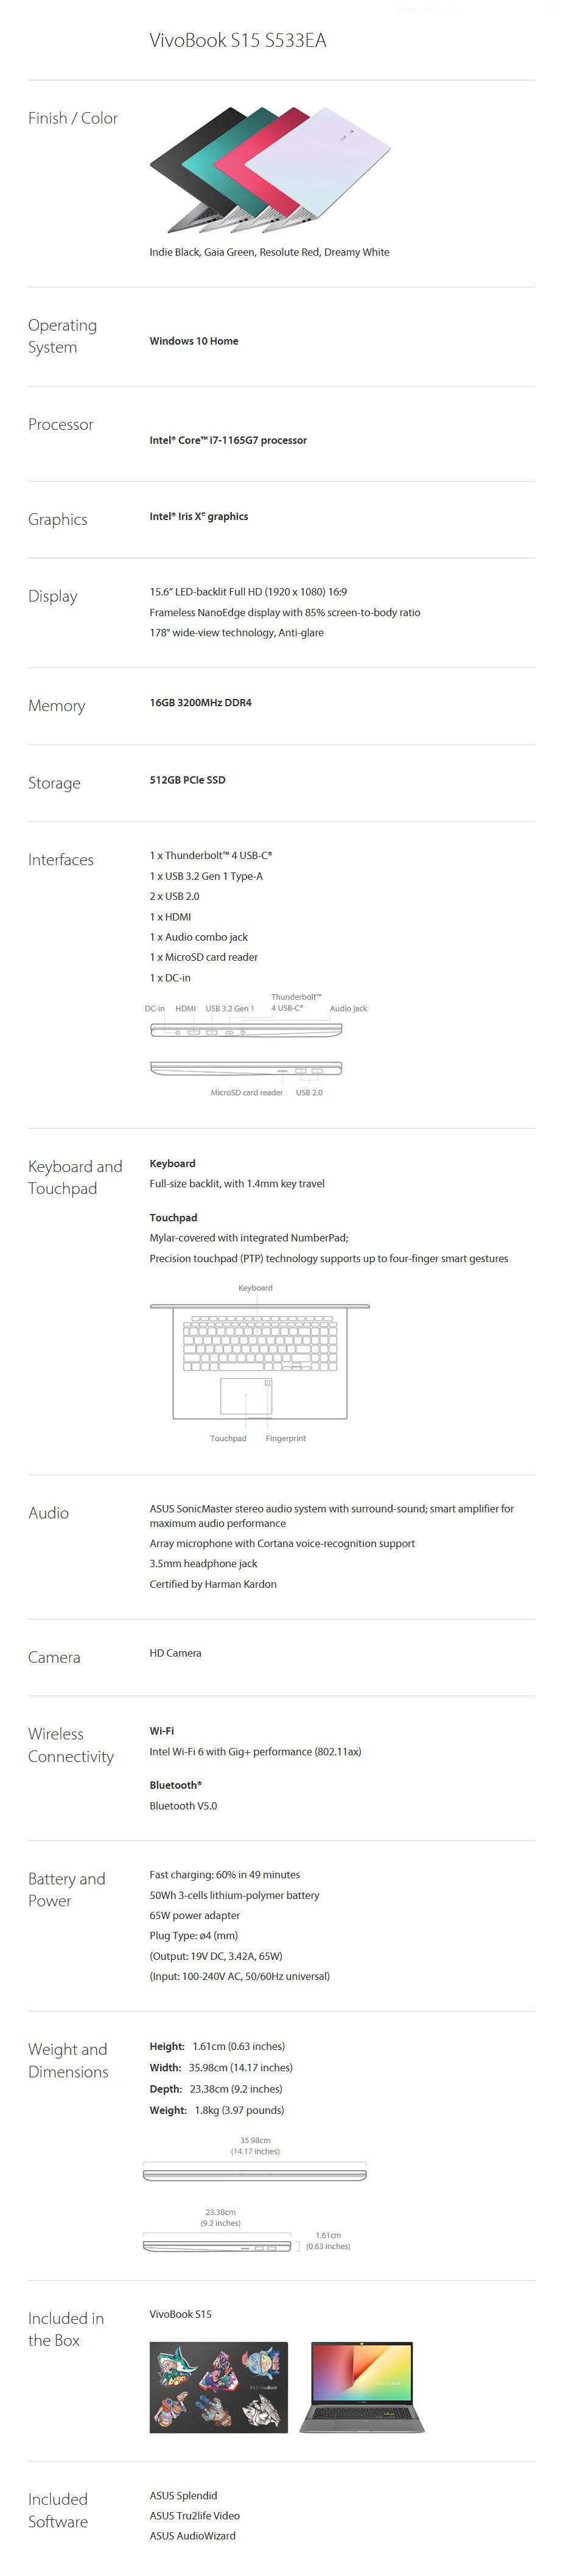 "ASUS VivoBook S15 S533EA 15.6"" Laptop i7-1165G7 16GB 512GB W10H - Black - Overview 2"